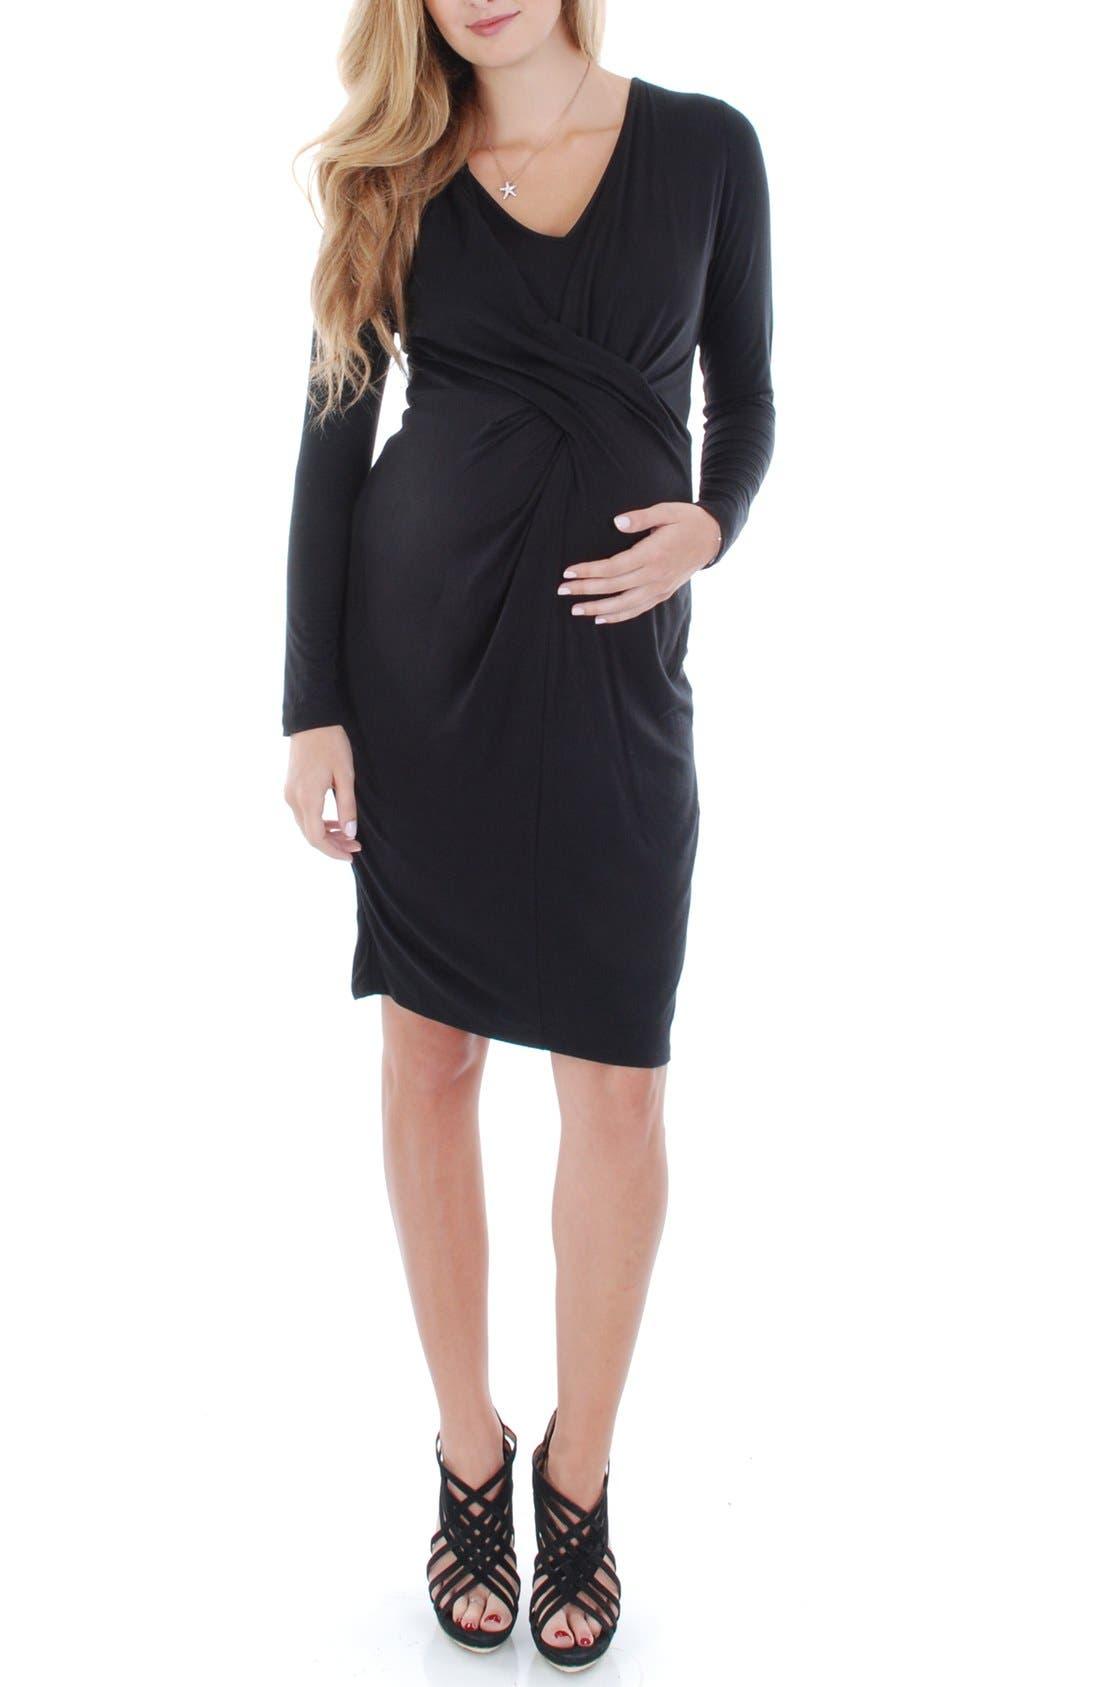 EVERLY GREY Sloan Maternity/Nursing Dress